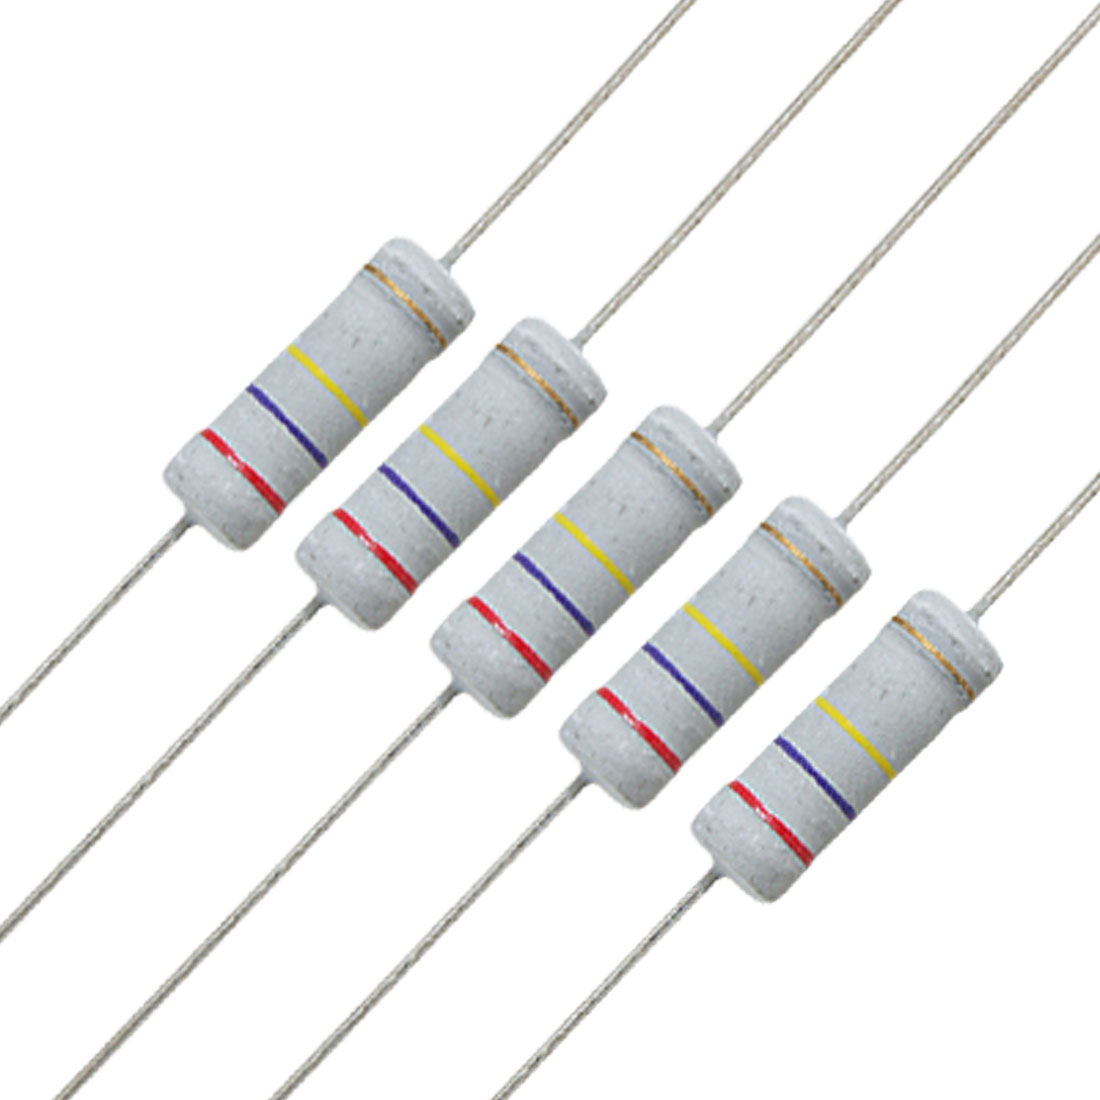 10 x 3W 500V 270K ohm 270KR Metal Oxide Film Resistors